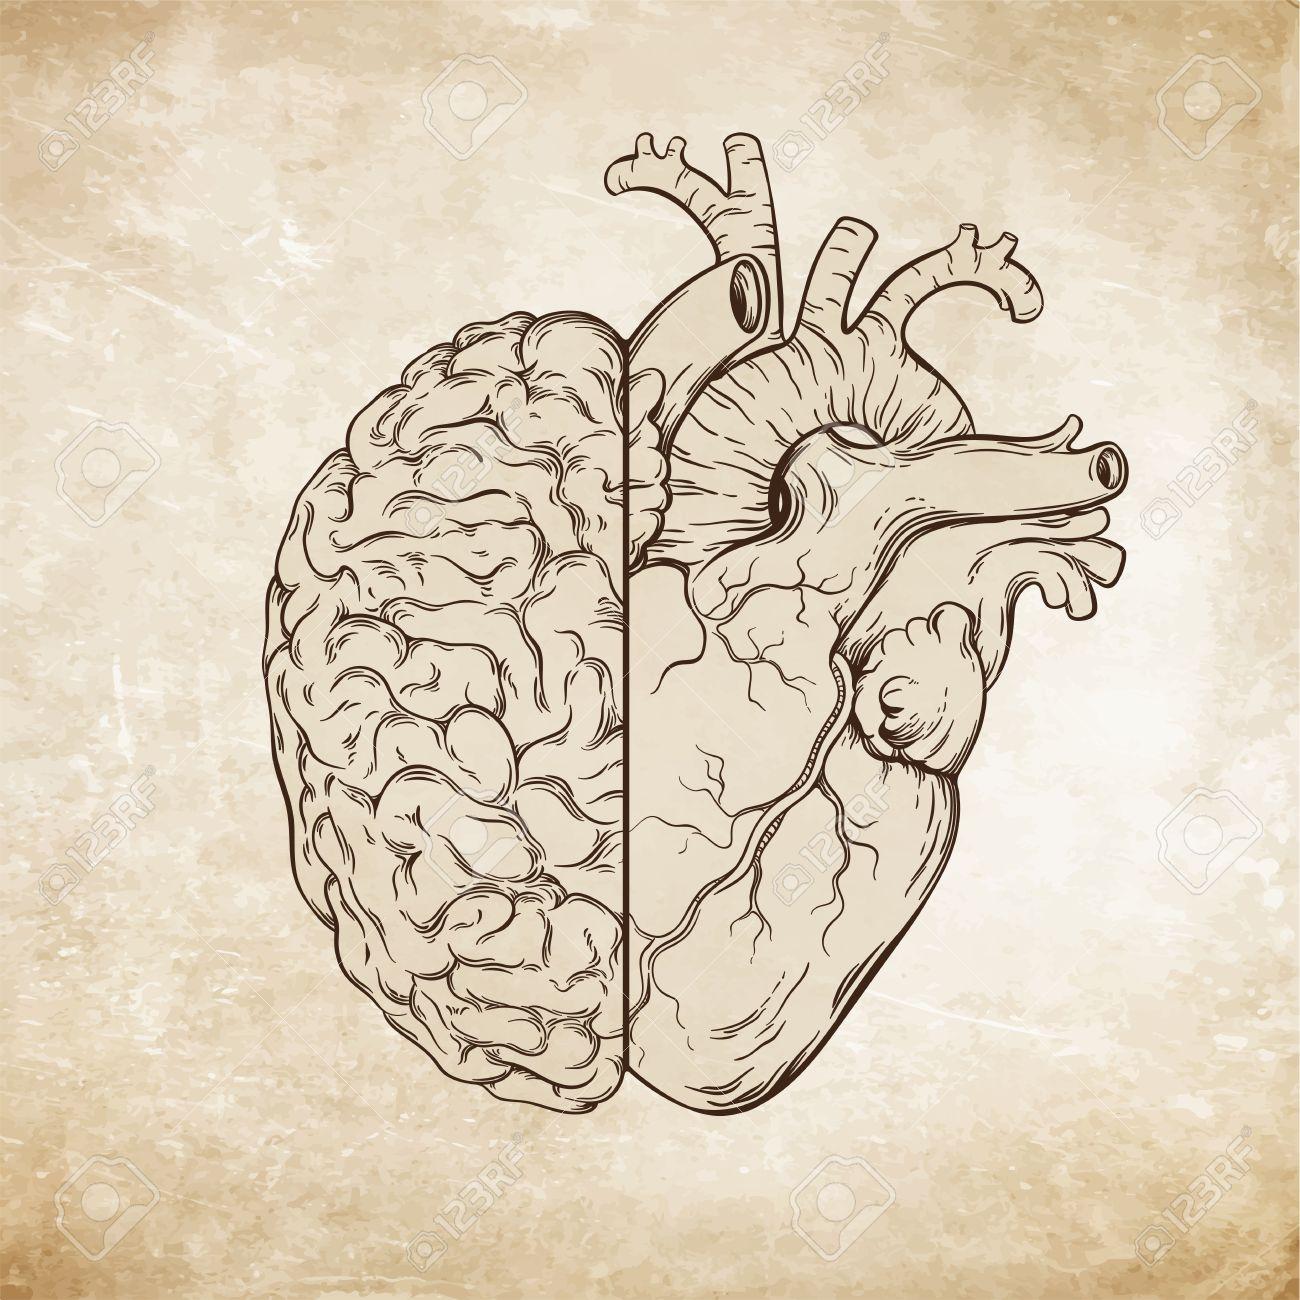 1300x1300 Hand Drawn Line Art Human Brain And Heart. Da Vinci Sketches